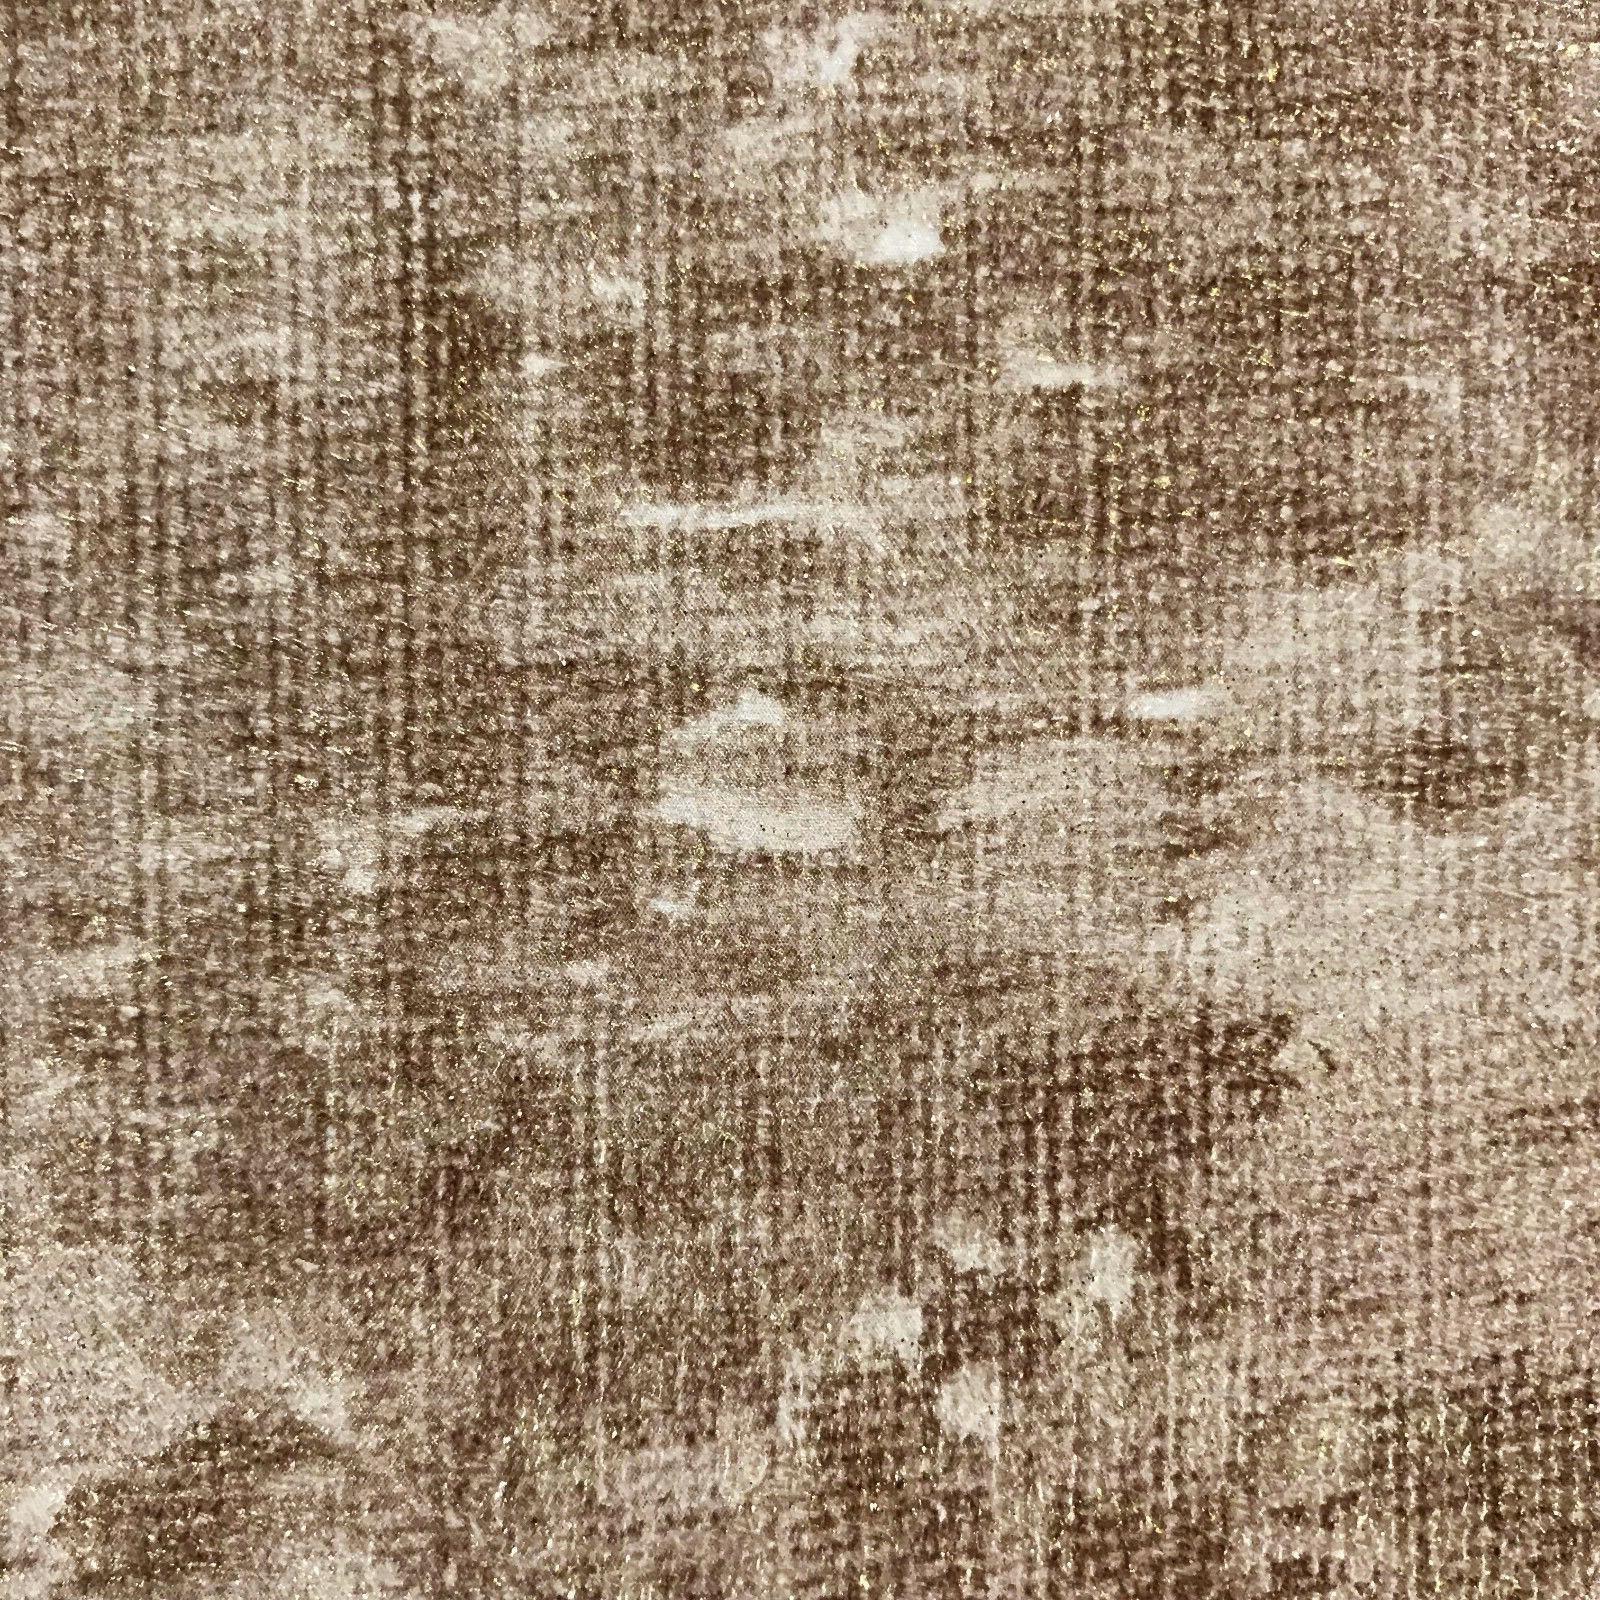 Faux City Wallpaper roll textured Vintage European Town